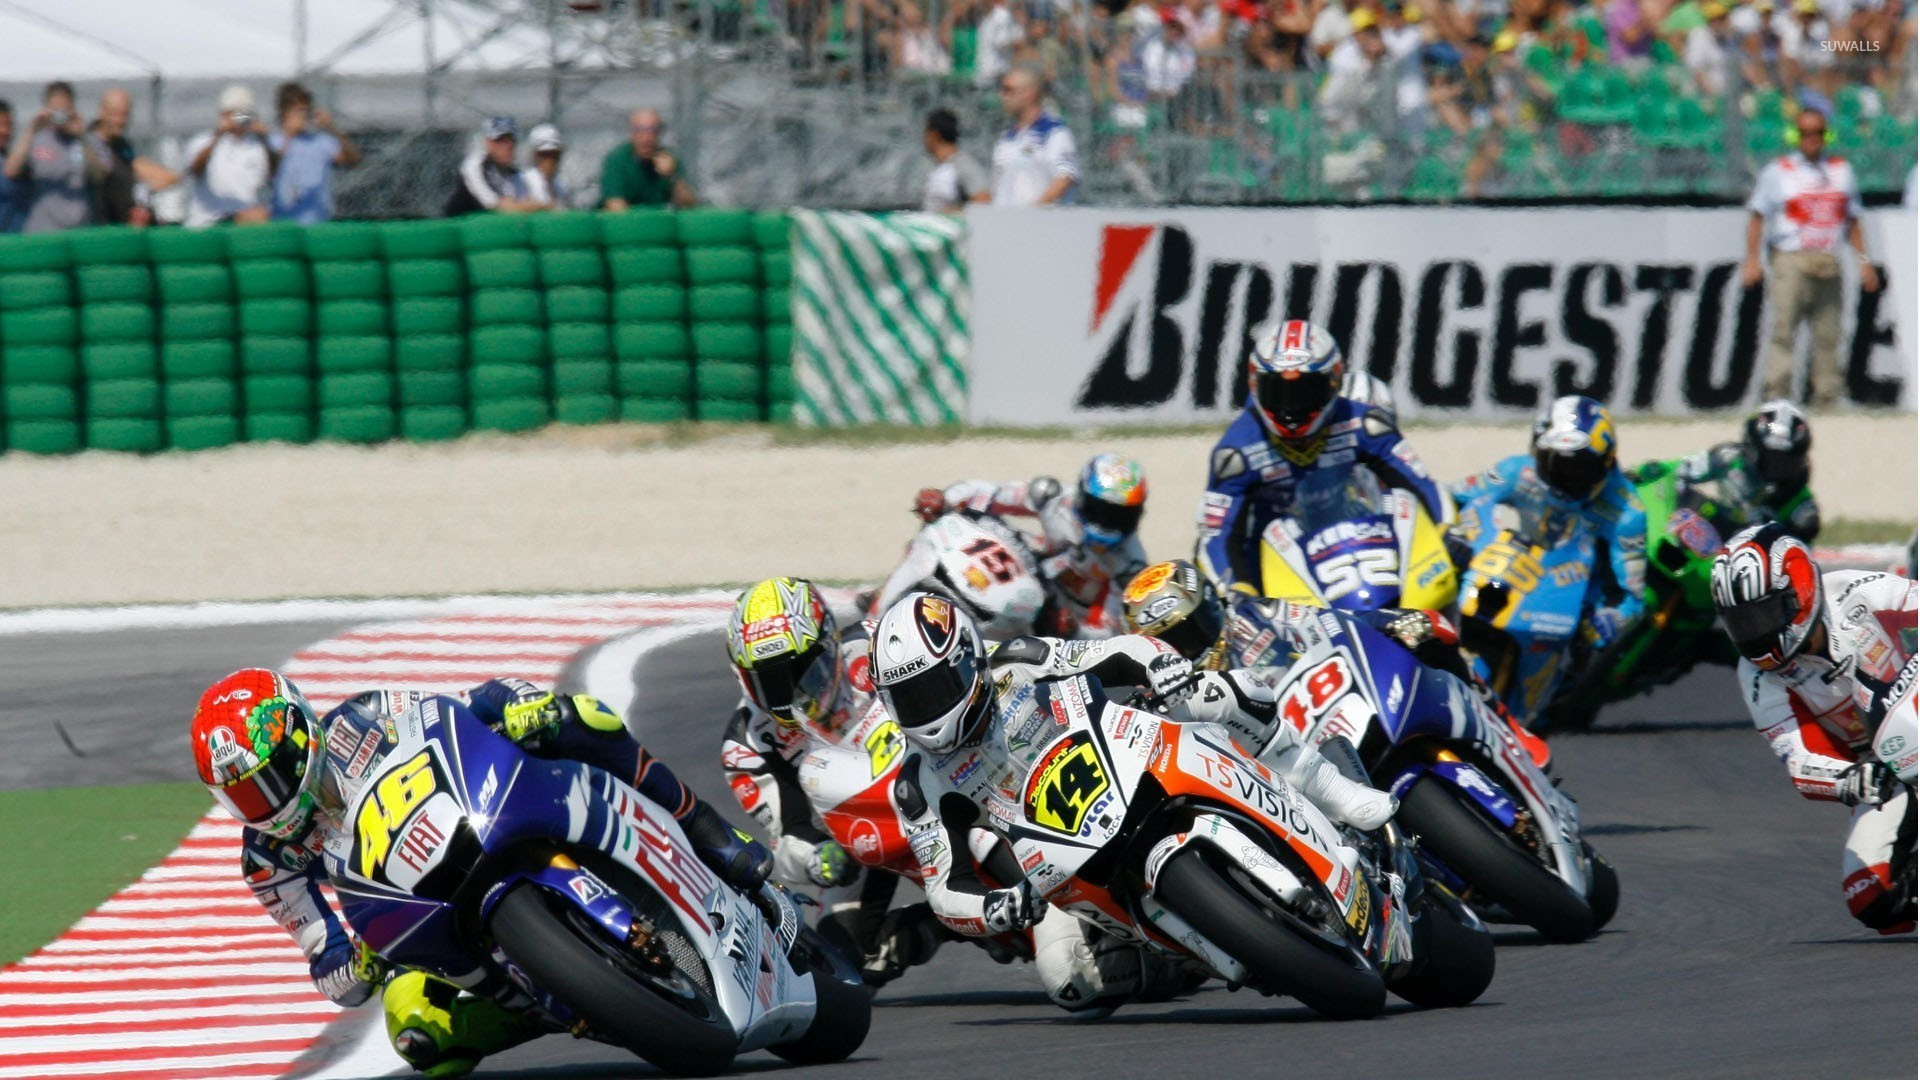 MotoGP wallpaper 1280×800